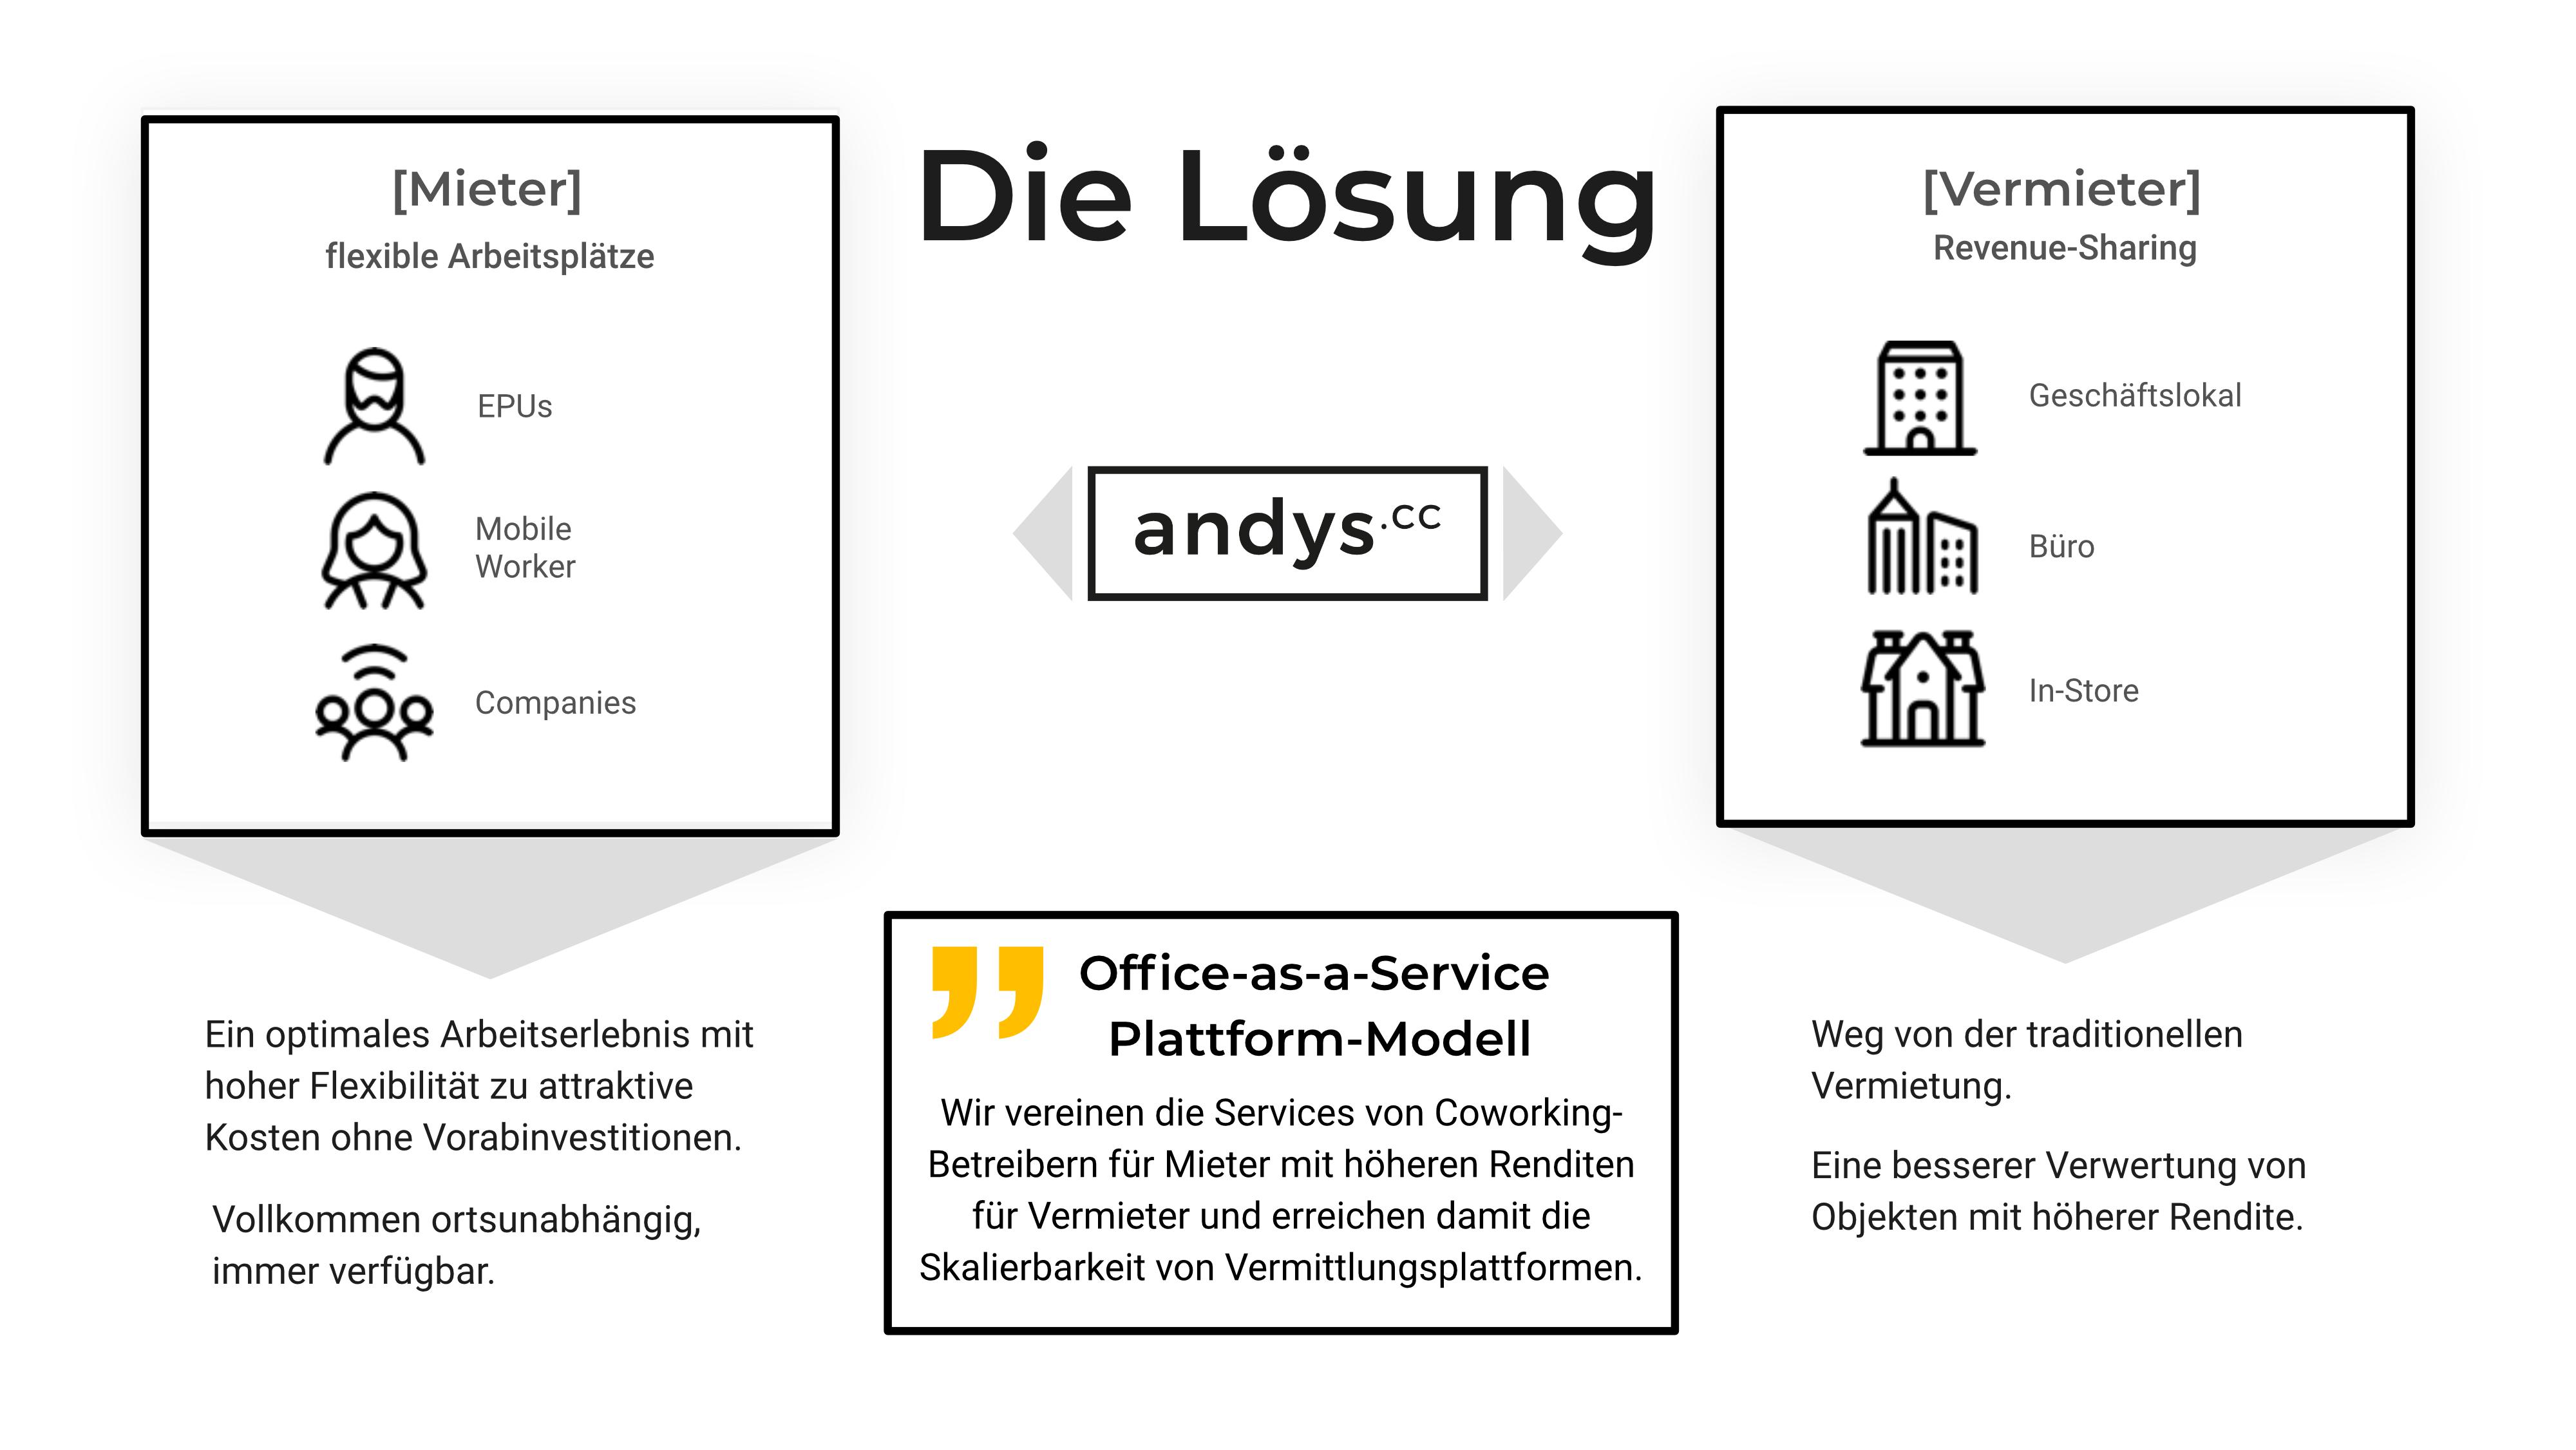 andys.cc - Lösung